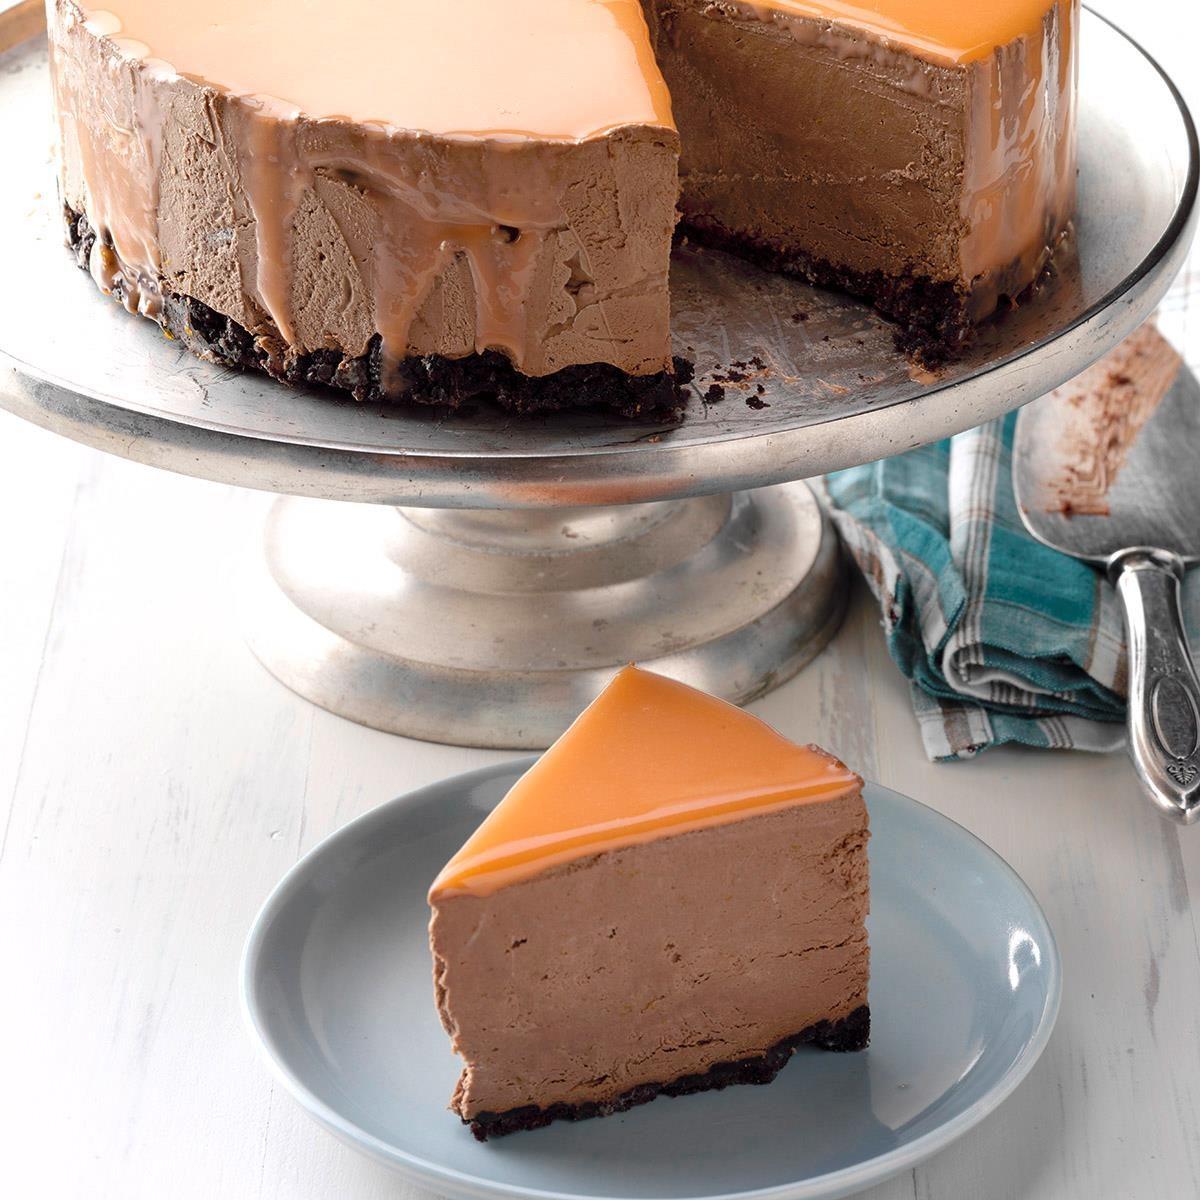 Orange Chocolate Mousse Mirror Cake Exps Thcom17 210212 D09 12 2b 7